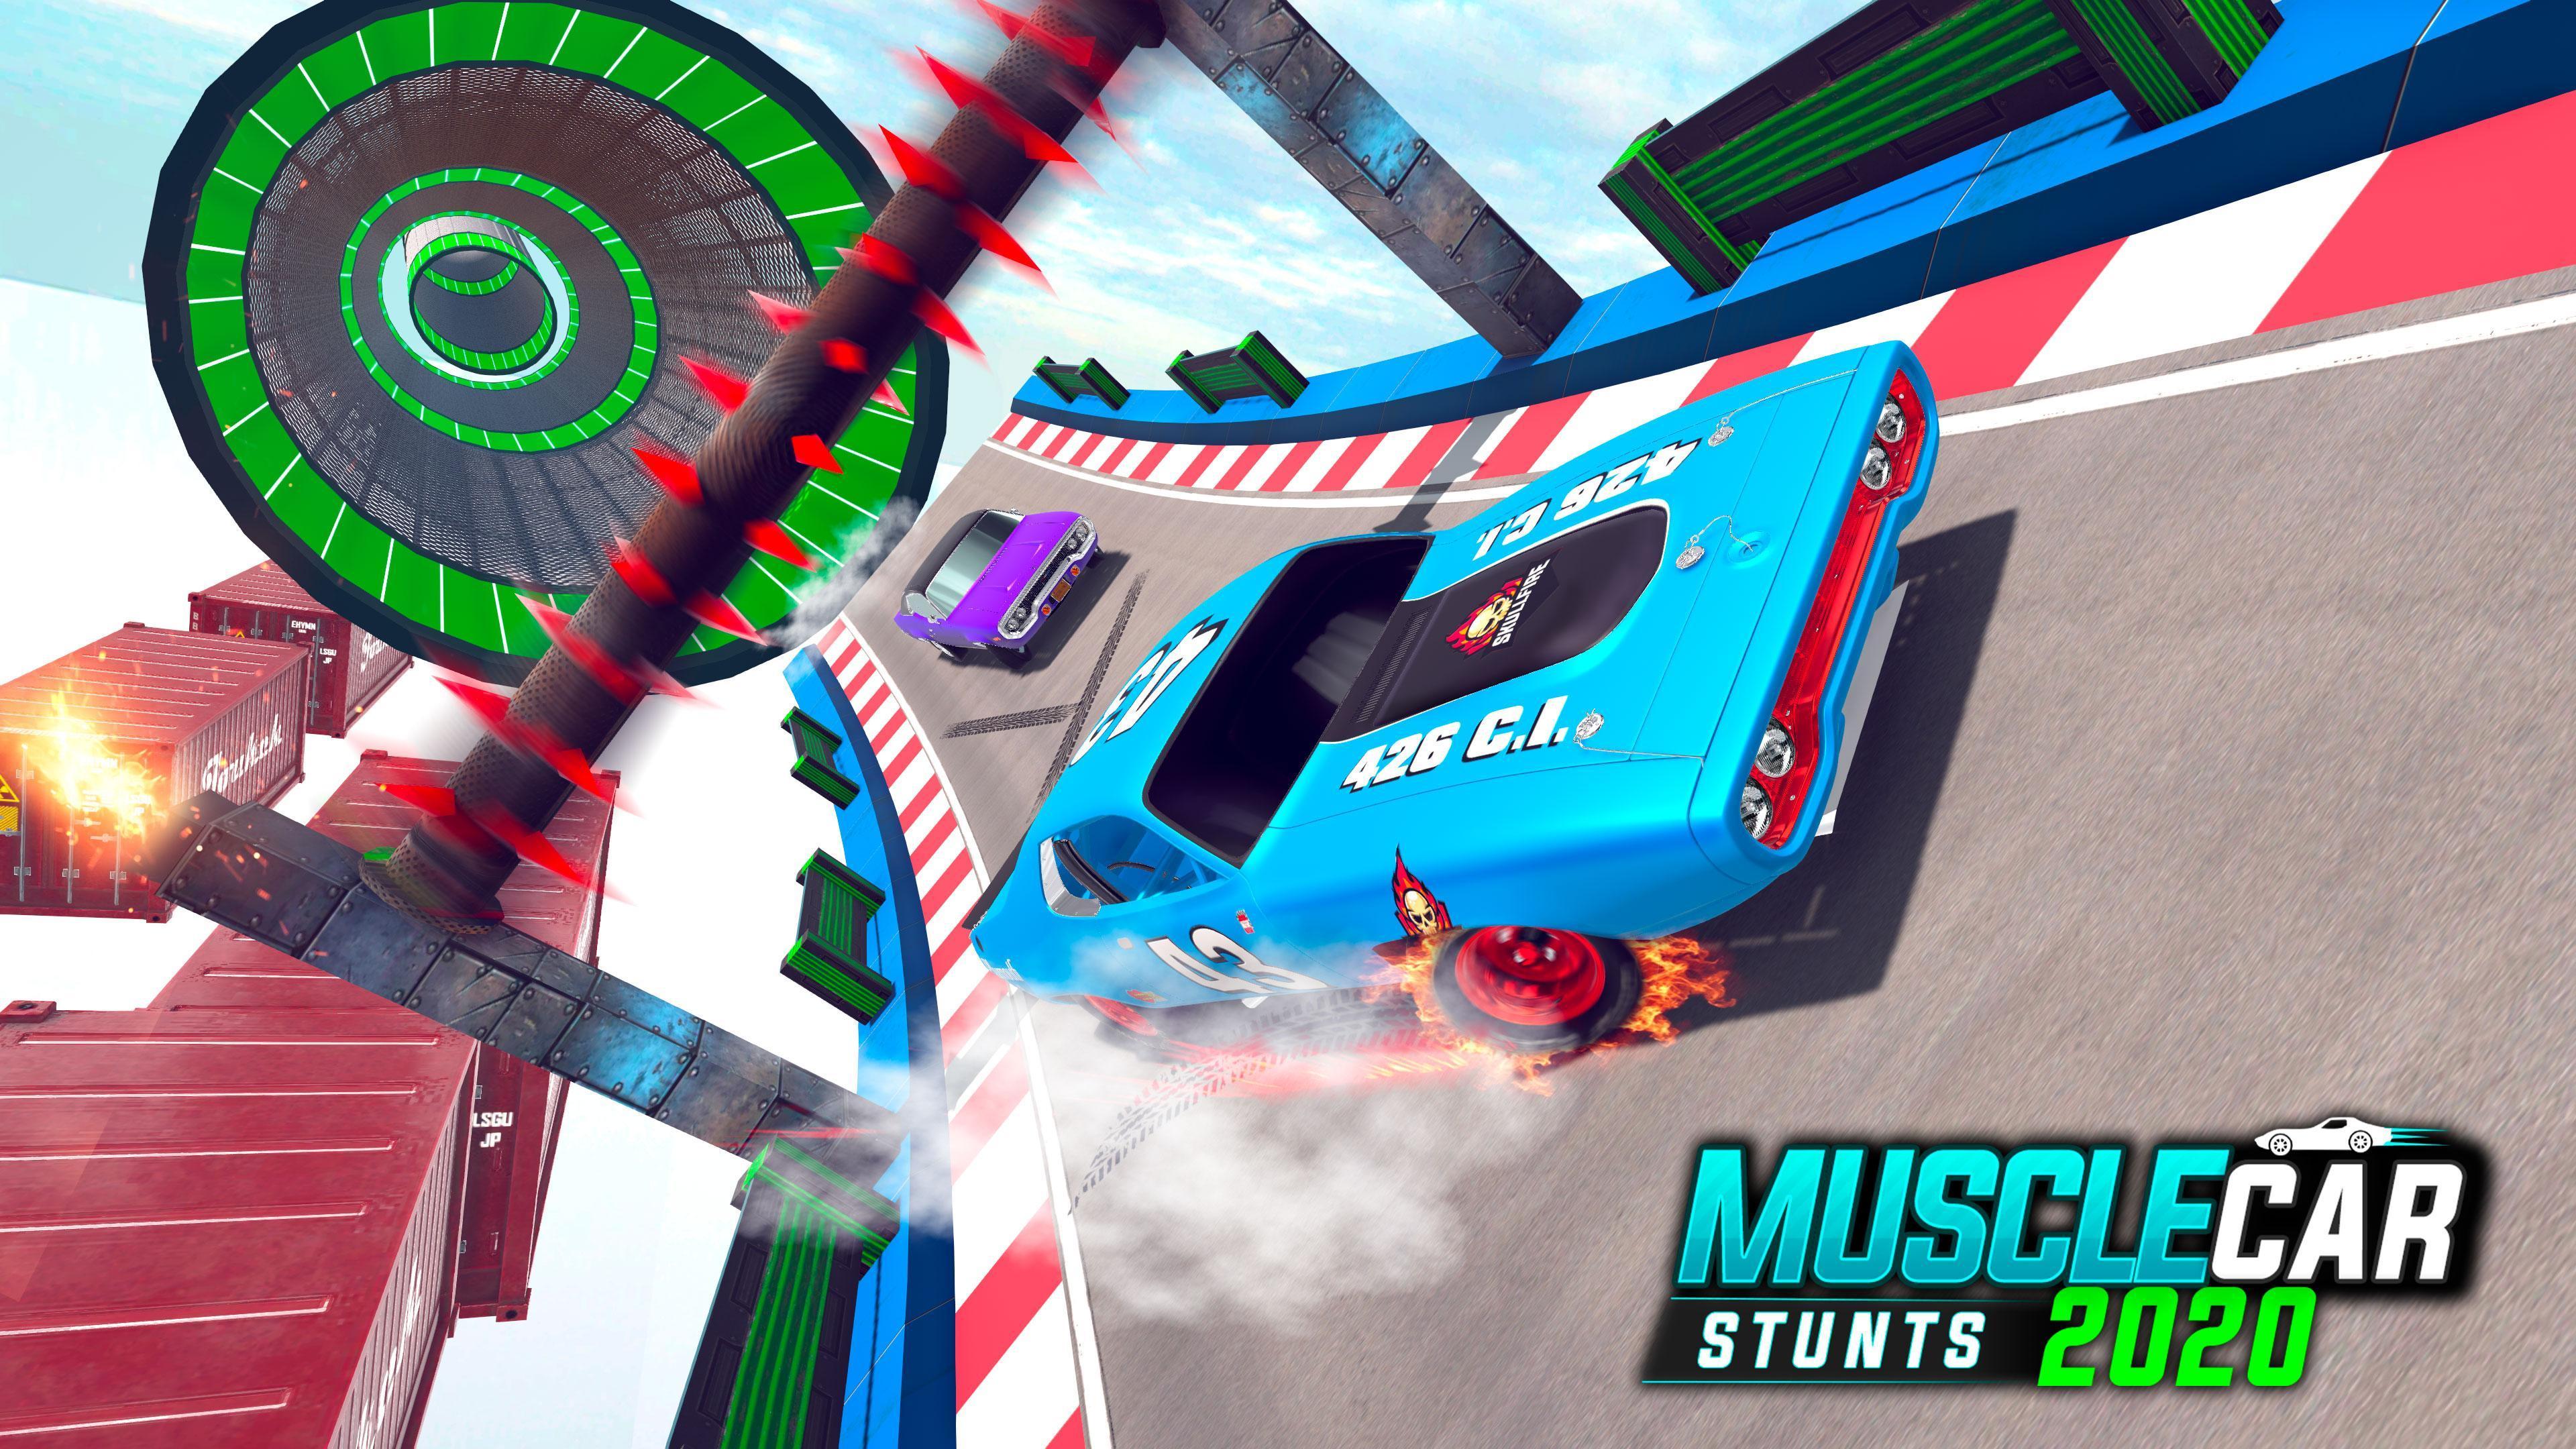 Muscle Car Stunts 2020 Mega Ramp Stunt Car Games 1.0.9 Screenshot 24